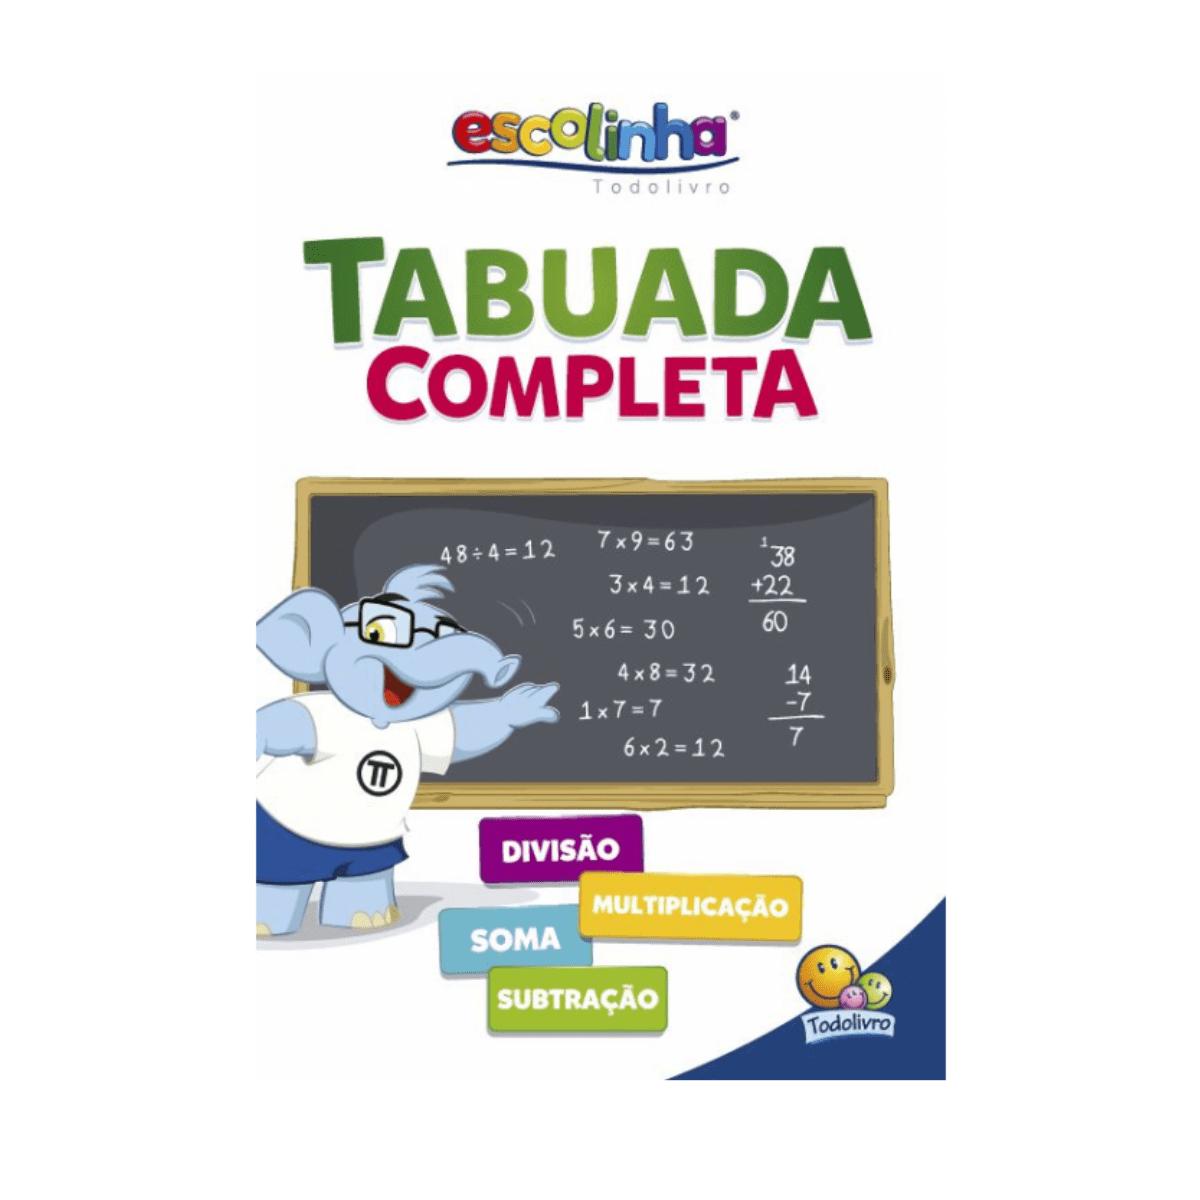 Tabuada completa - Todolivro